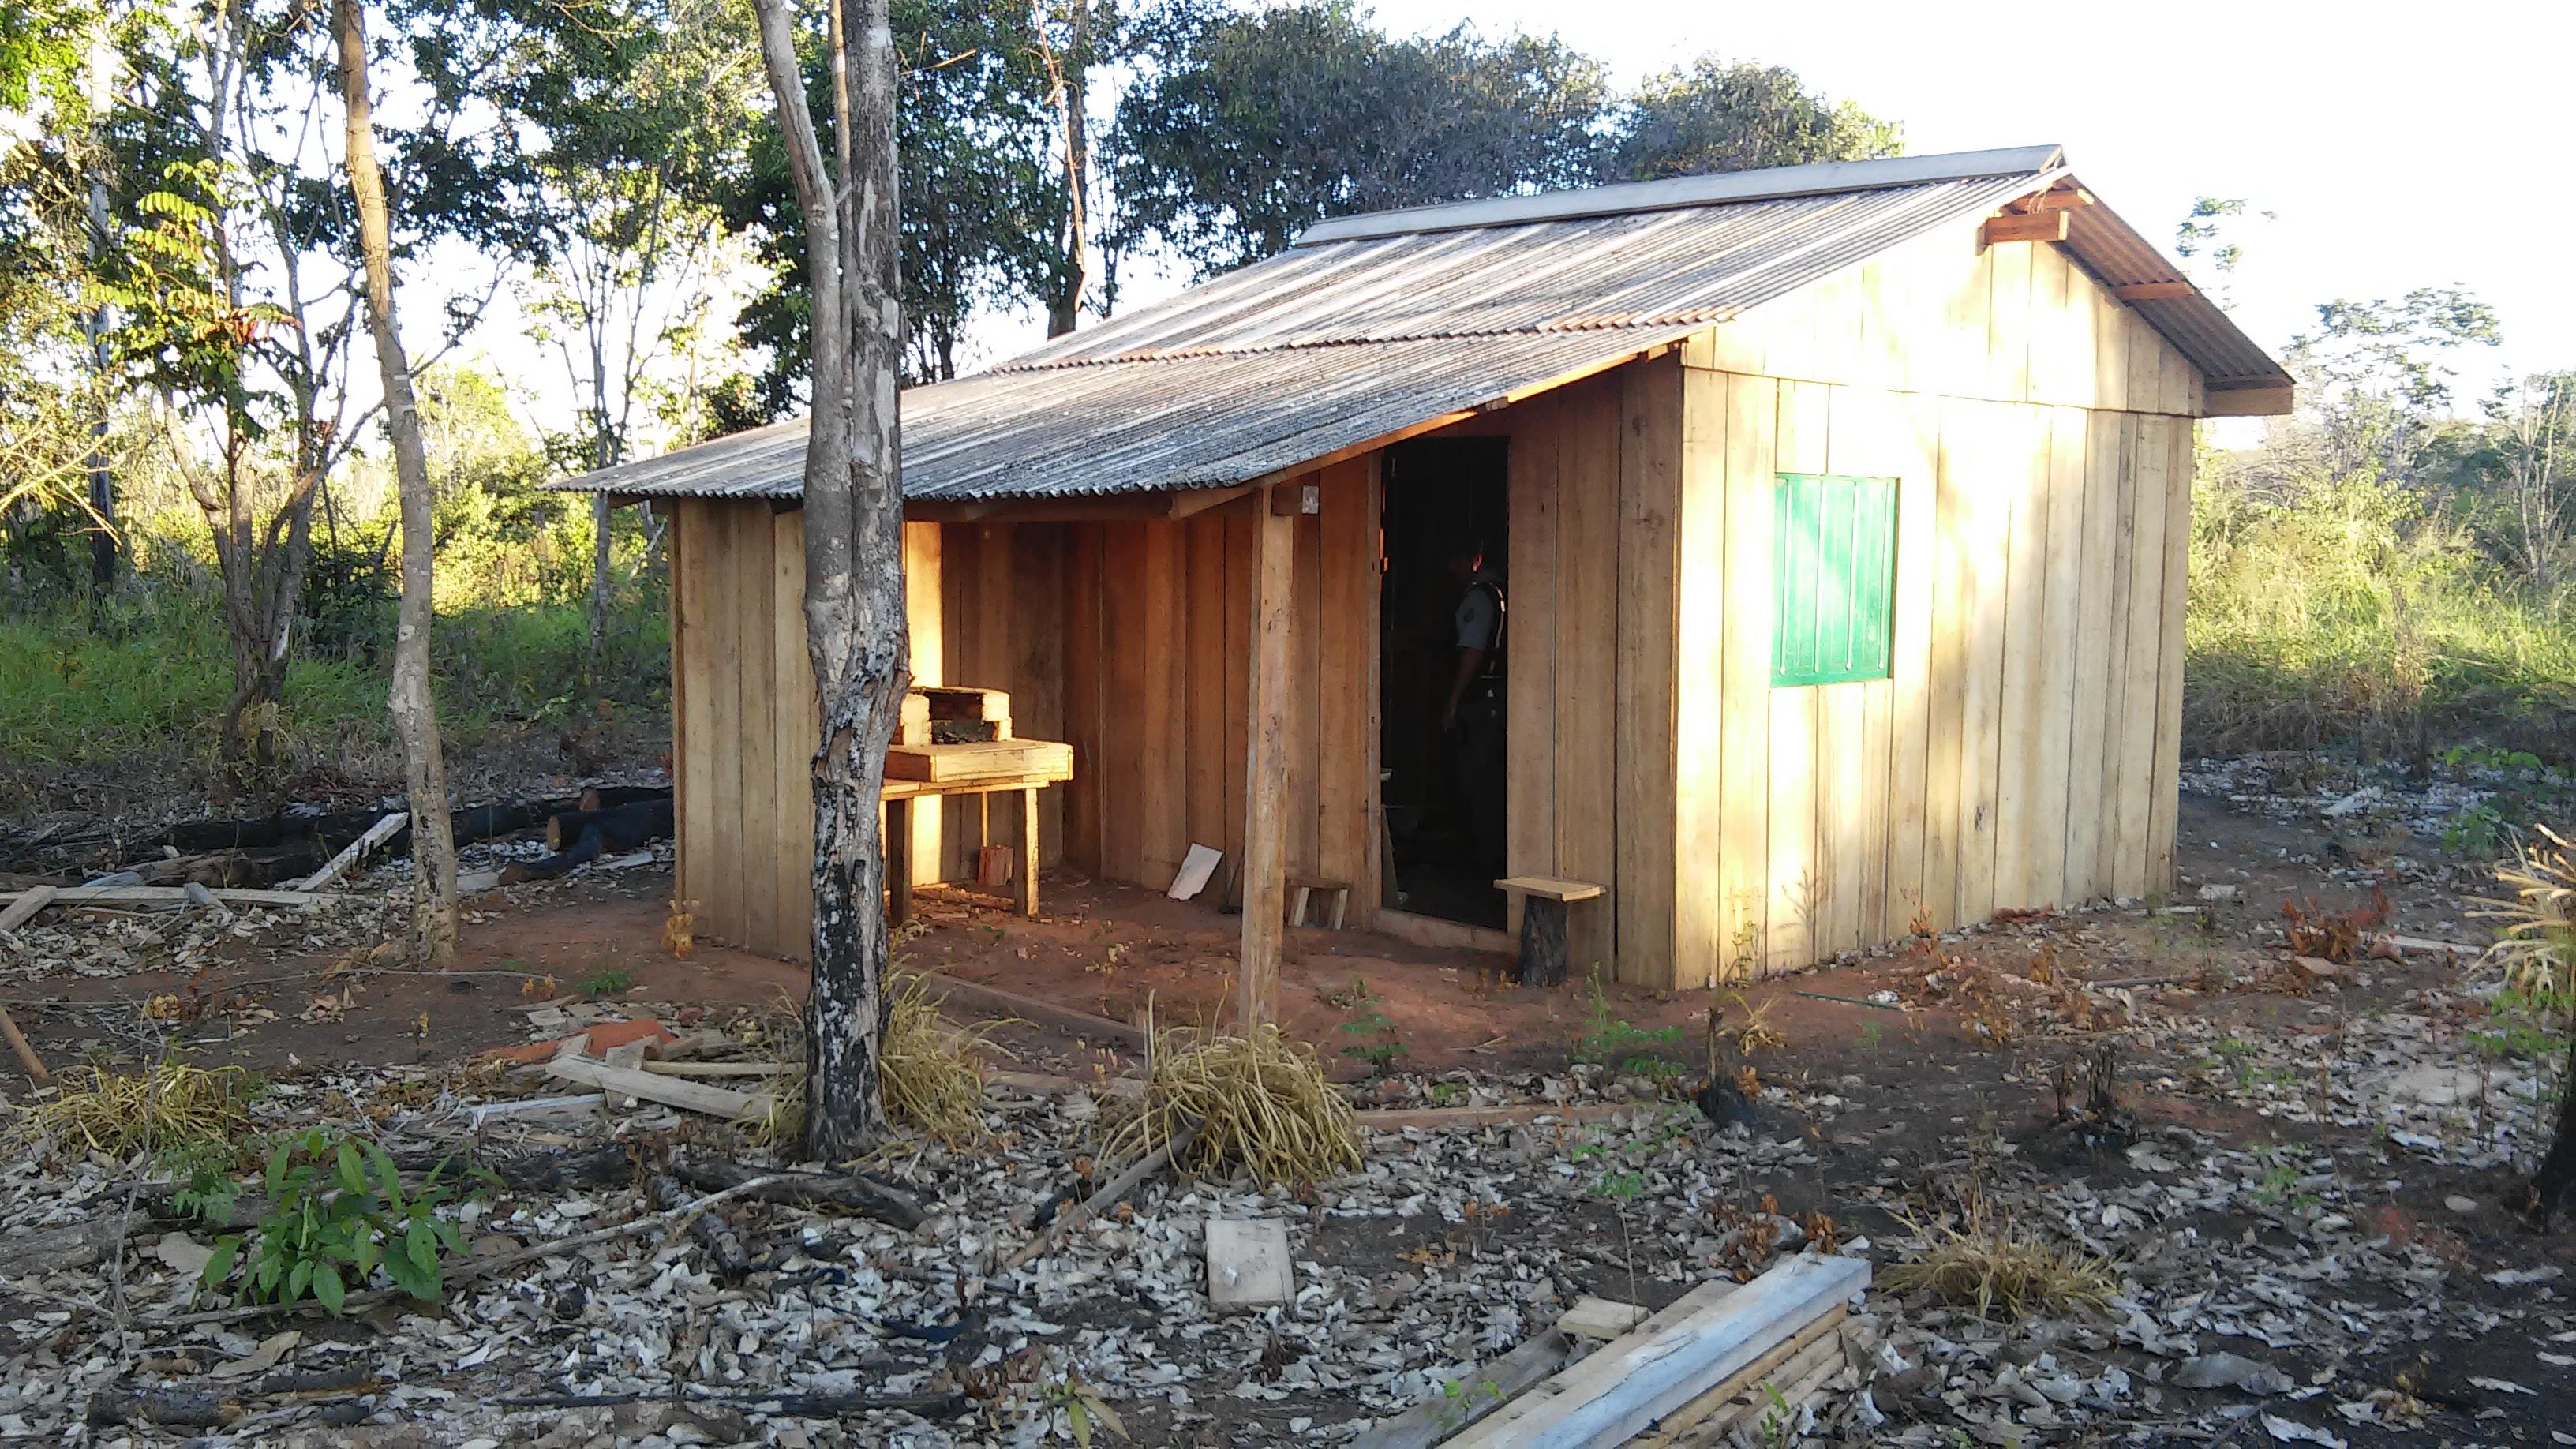 União do Sul Mato Grosso fonte: upload.wikimedia.org